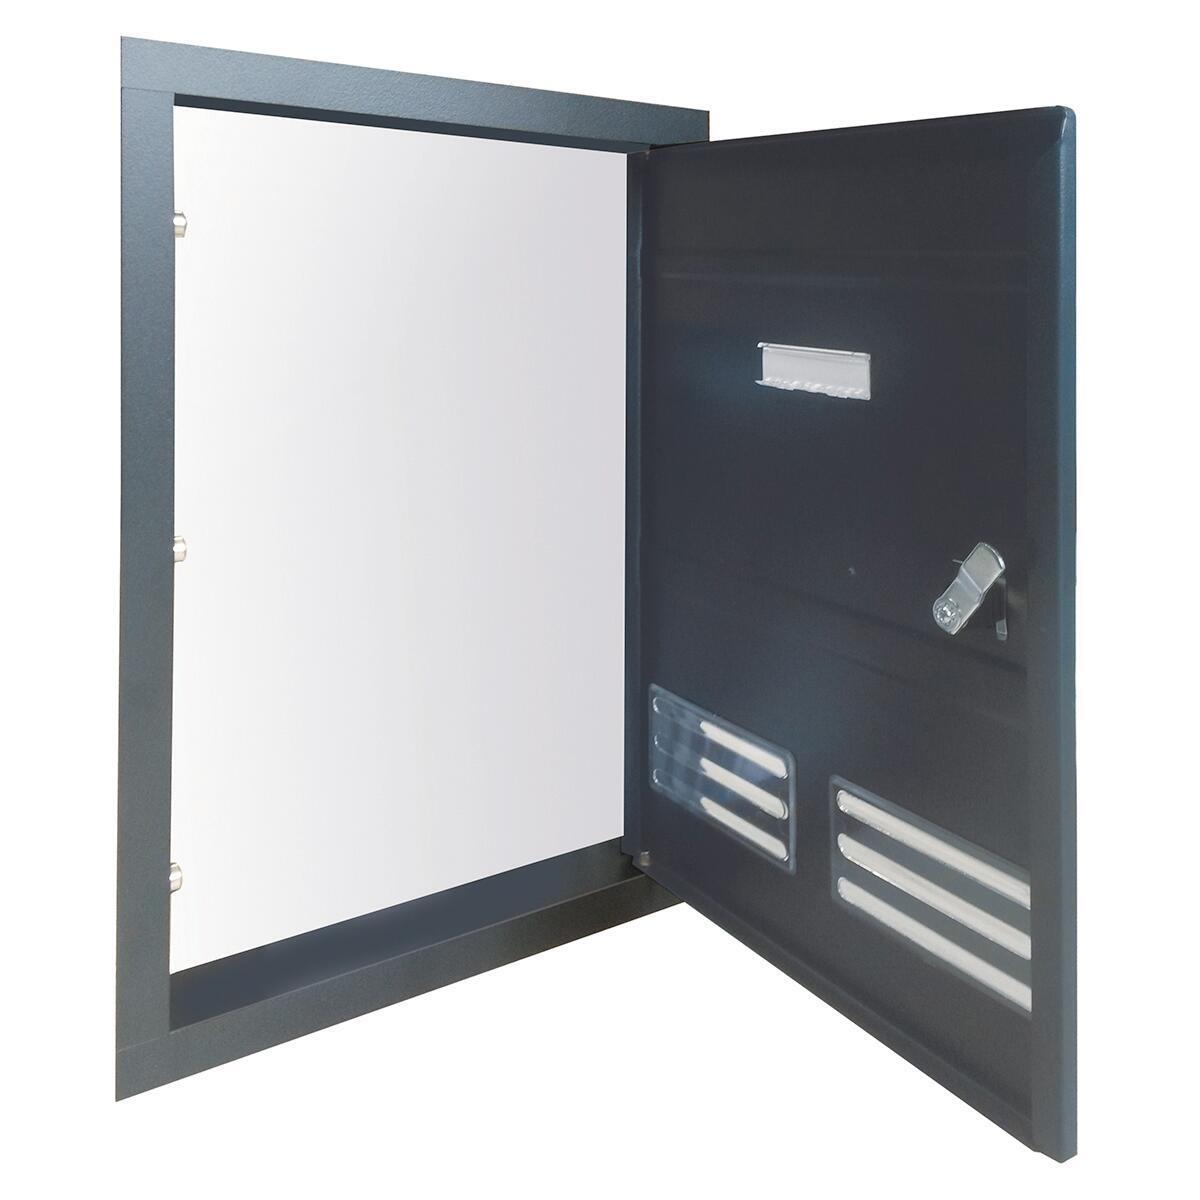 Sportello per cassetta postale ALUBOX da incasso in ghisa L 29 x H 40 cm - 3